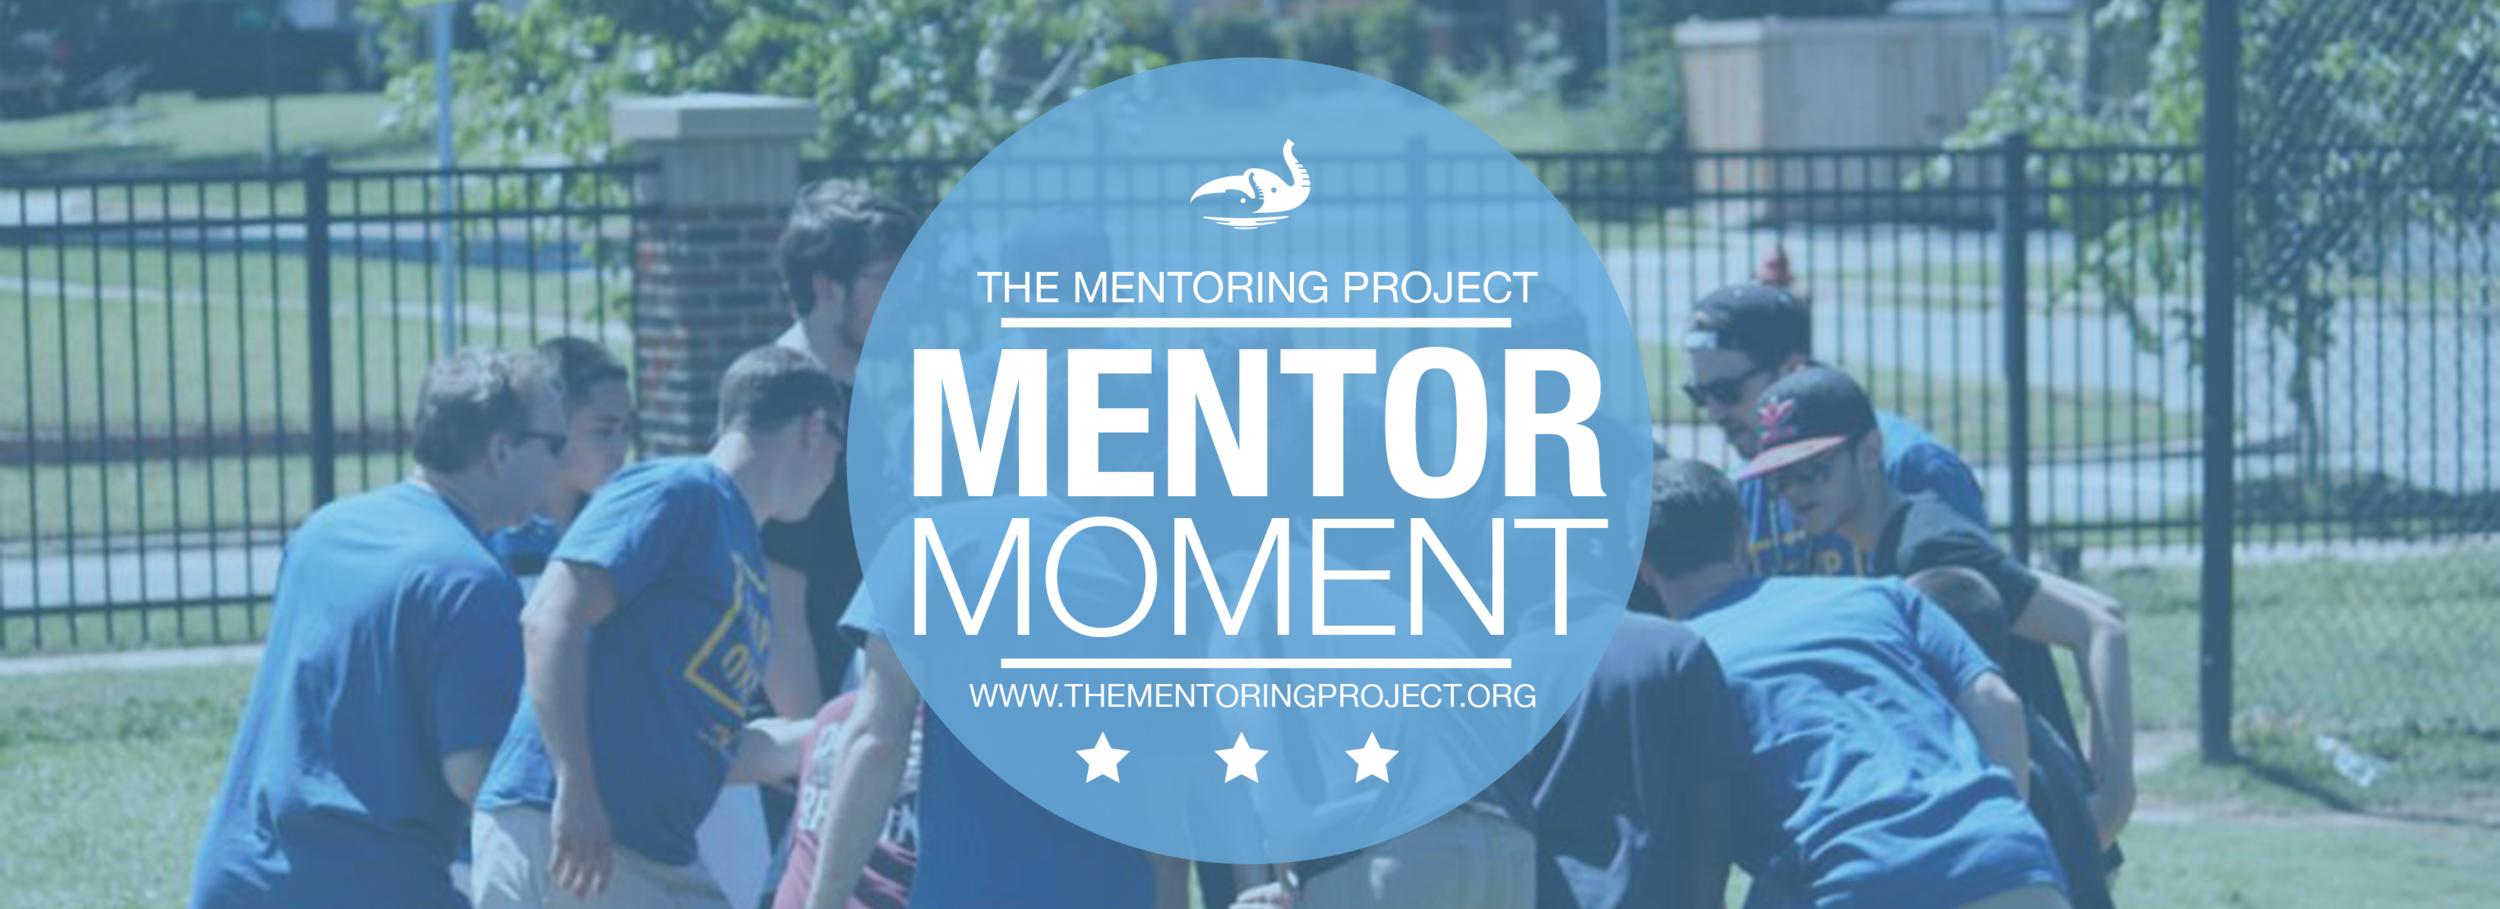 Mentor Moment Banner.png